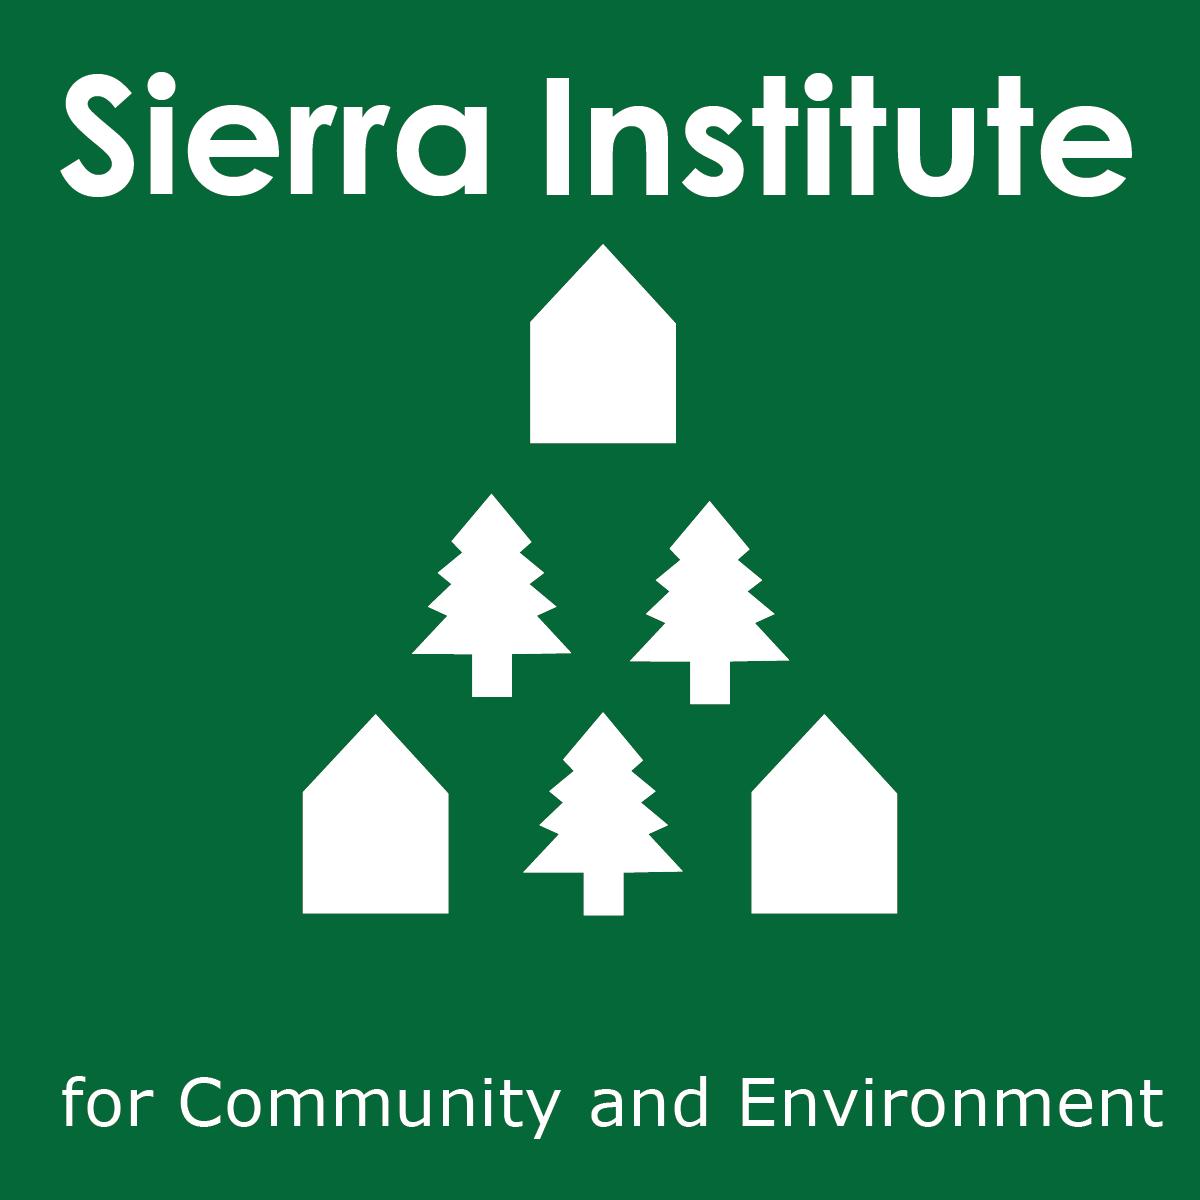 Sierra Institute